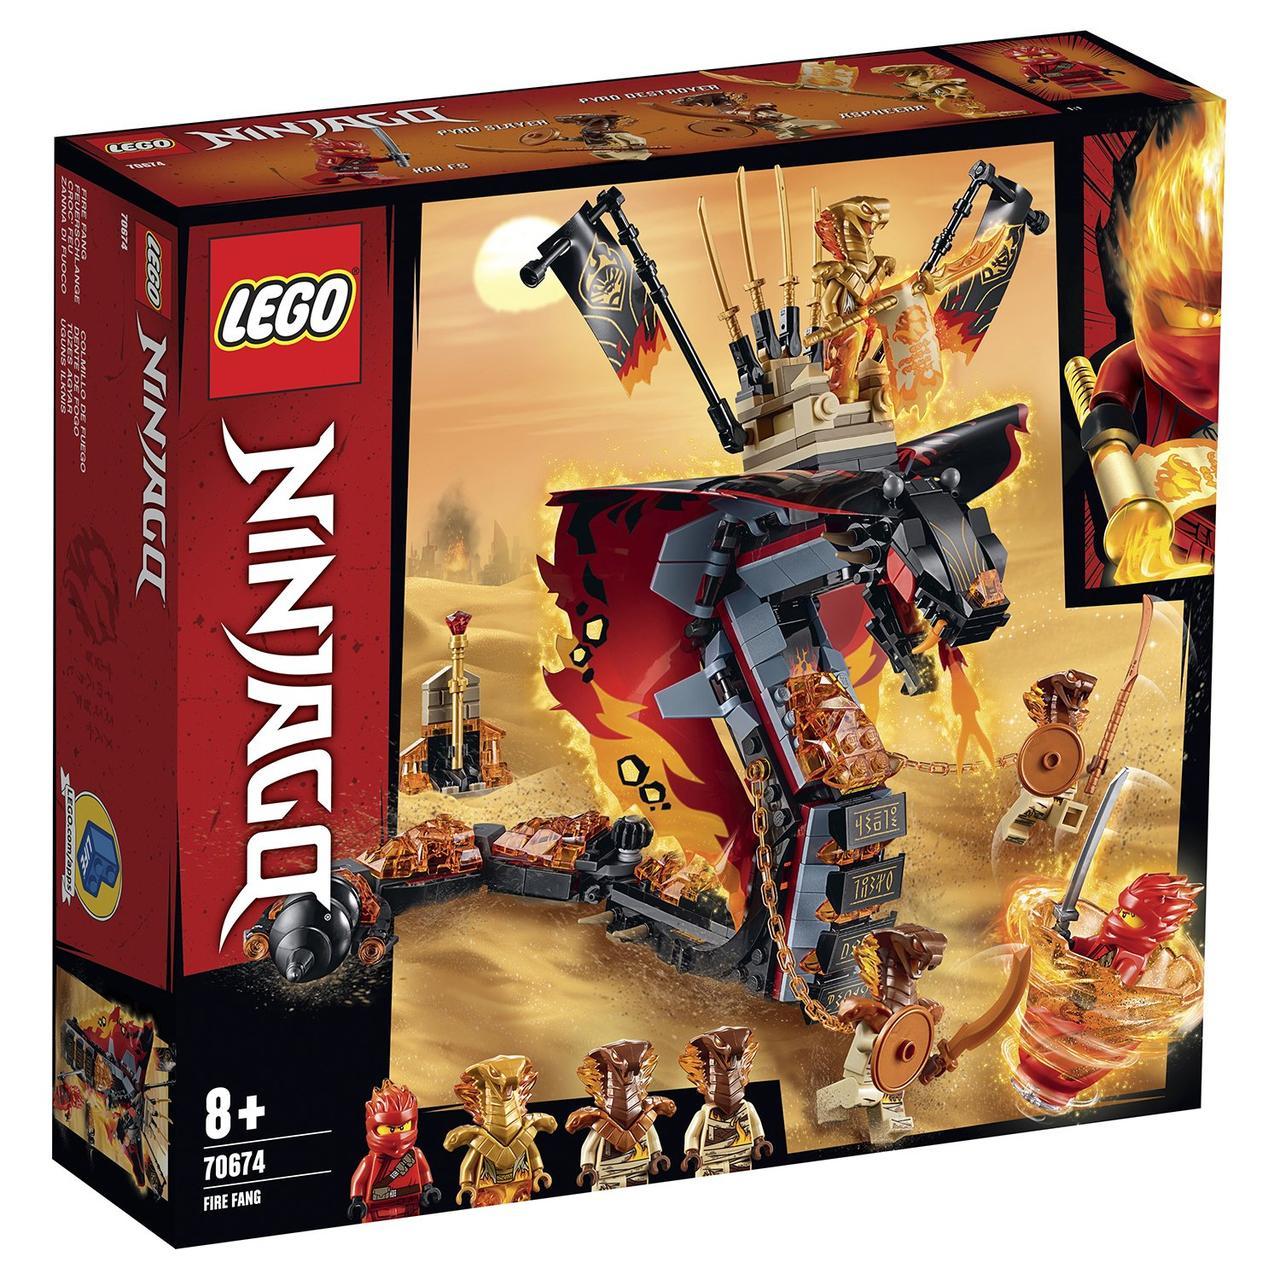 70674 Lego Ninjago Огненный кинжал, Лего Ниндзяго